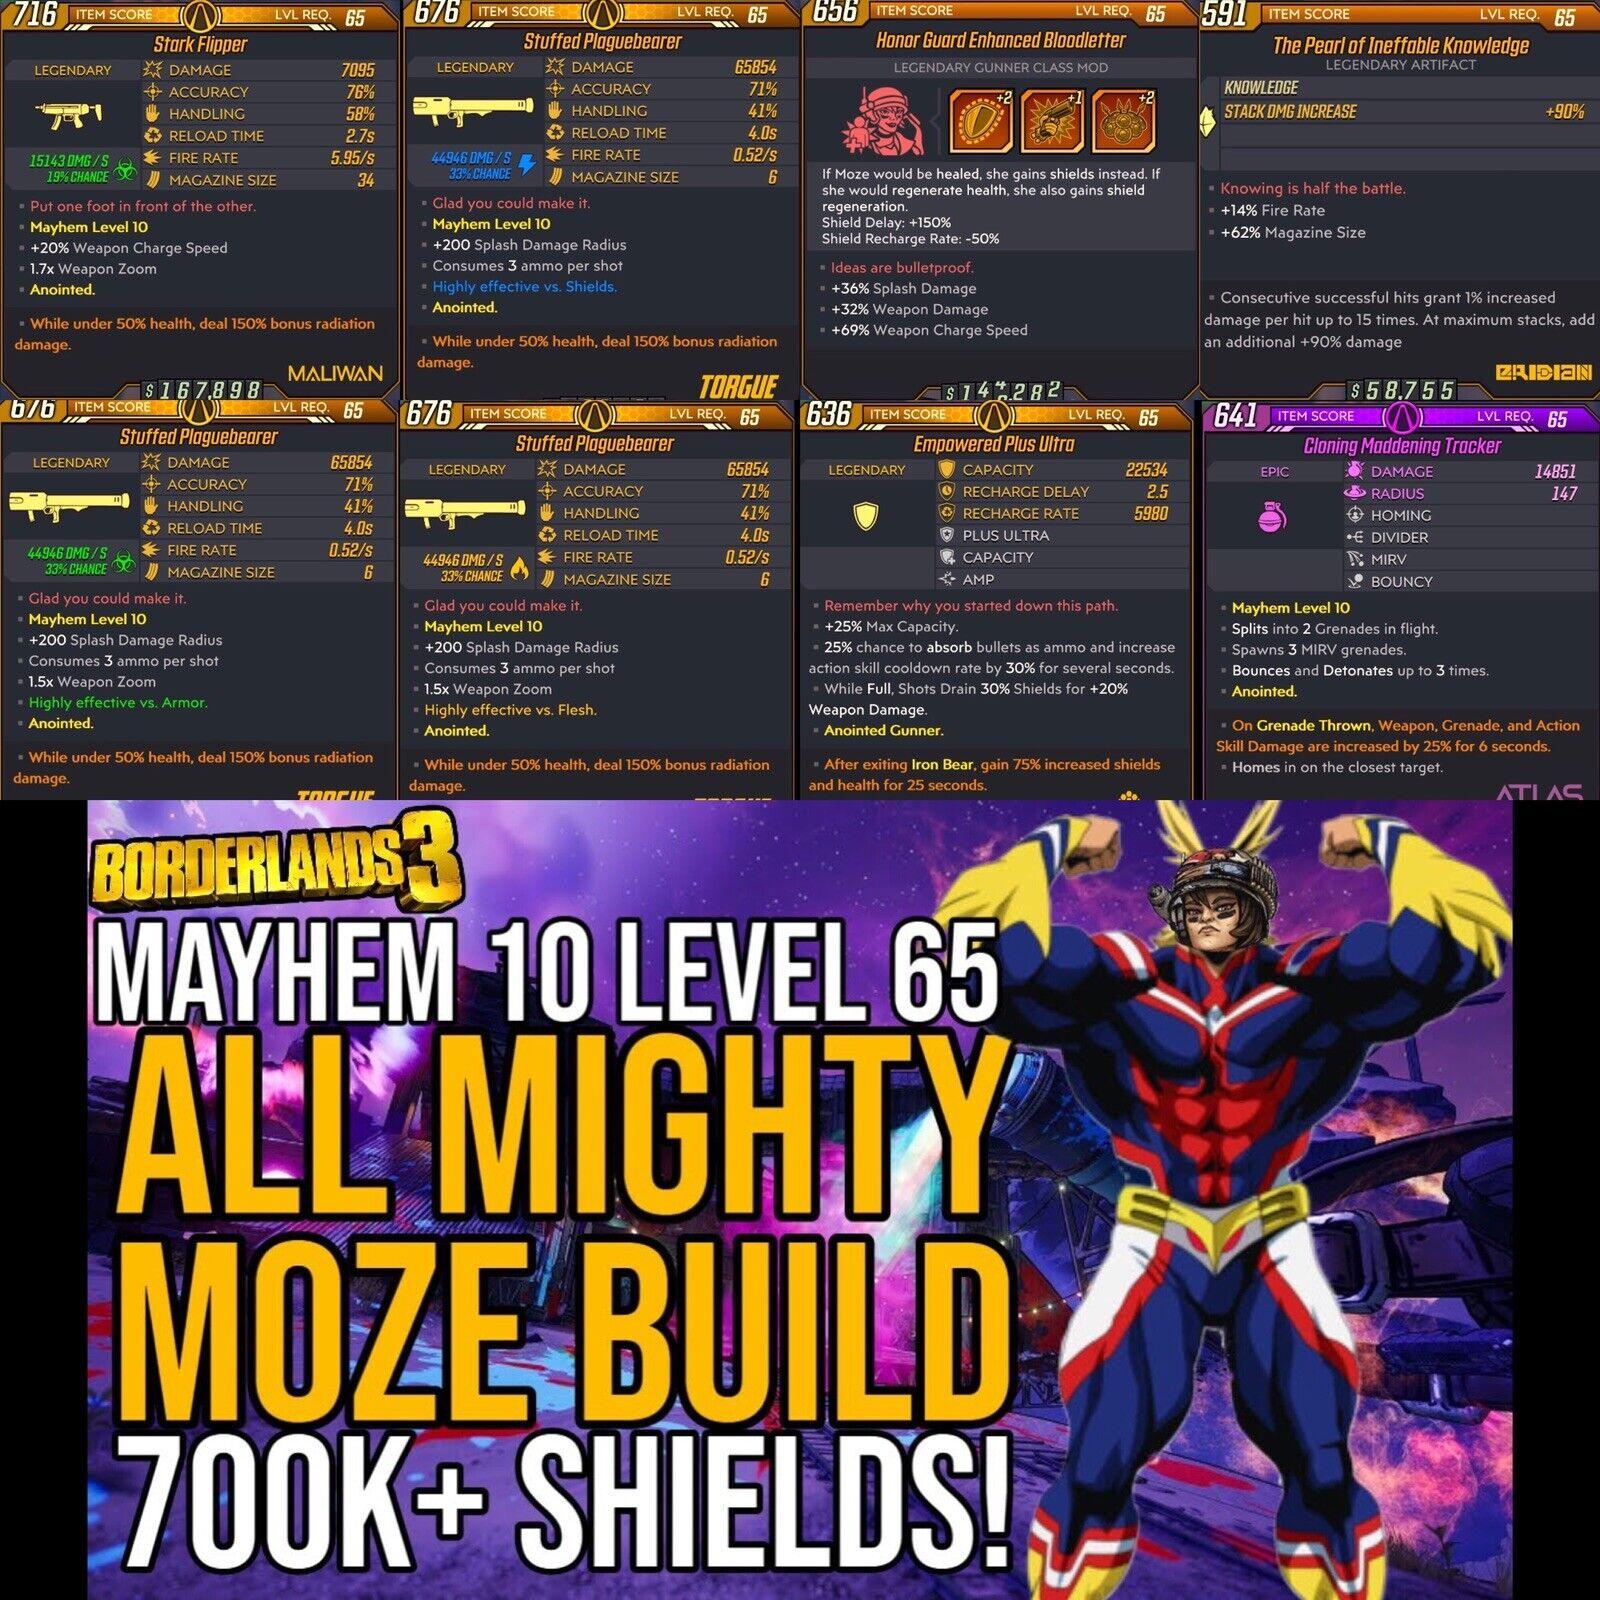 Borderlands 3 Xbox/PC - Level 65 Mayhem 10 All Mighty Moze Build 8 Items